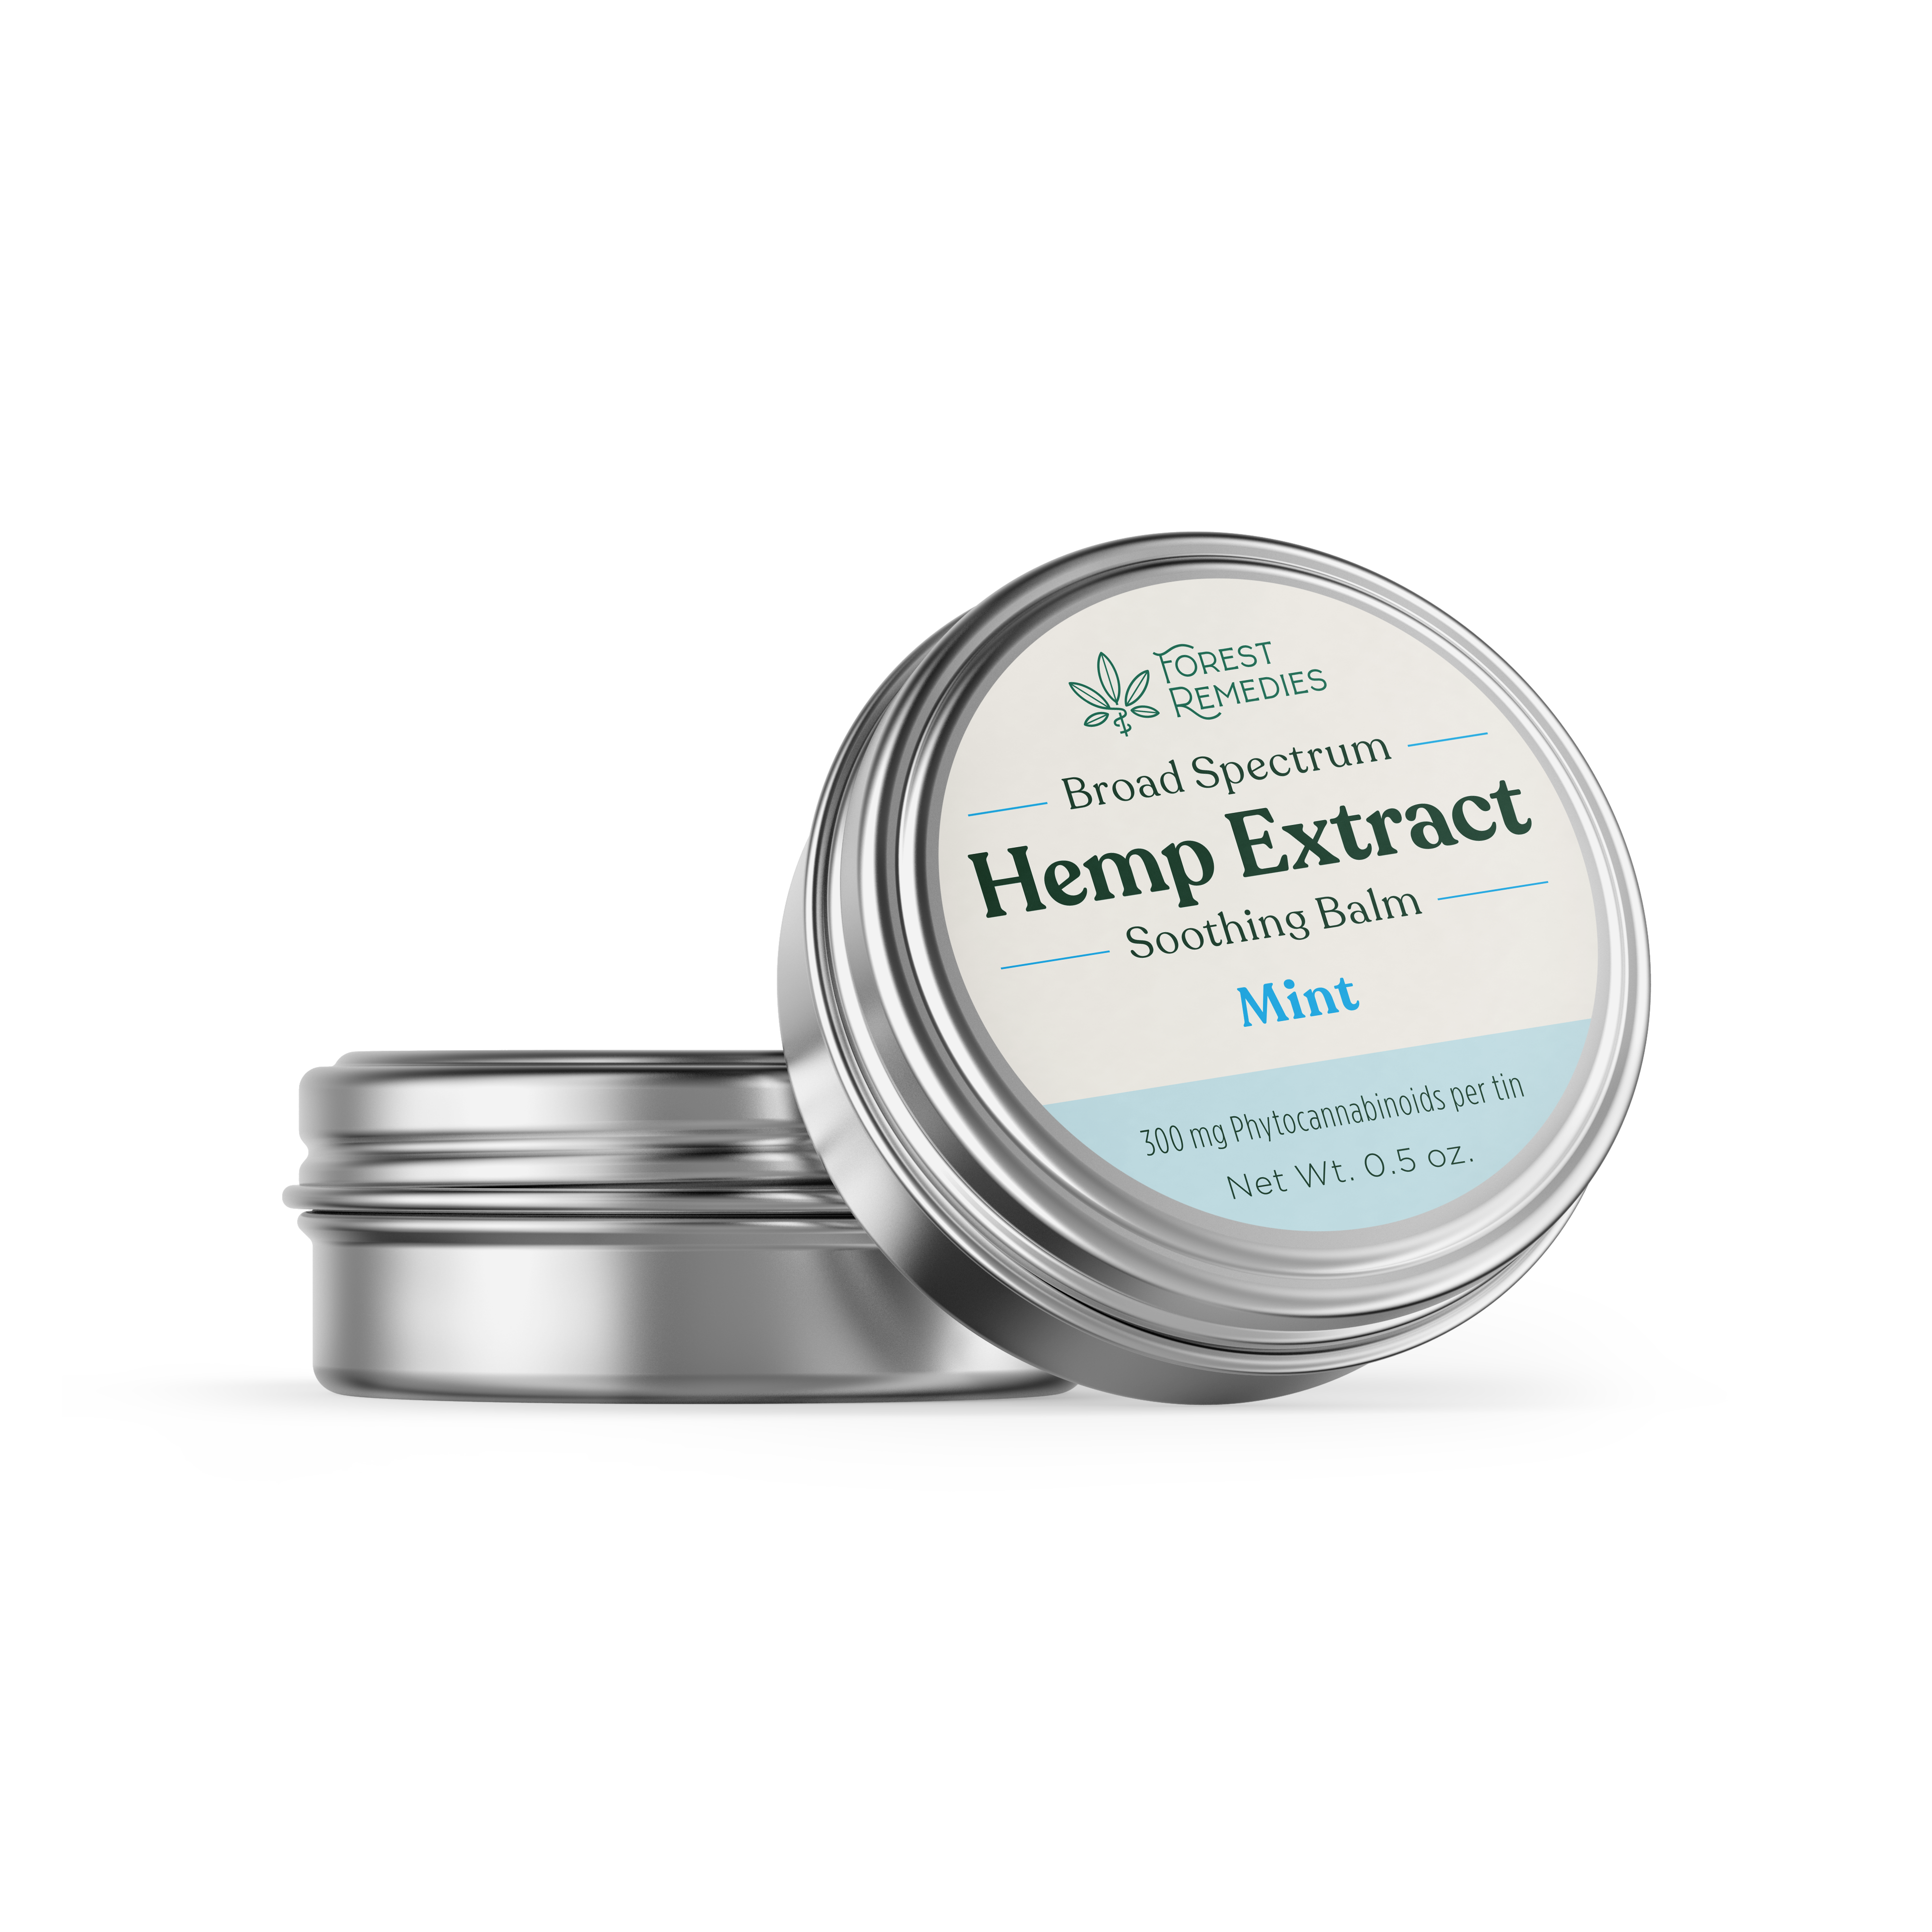 Forest Remedies Mint